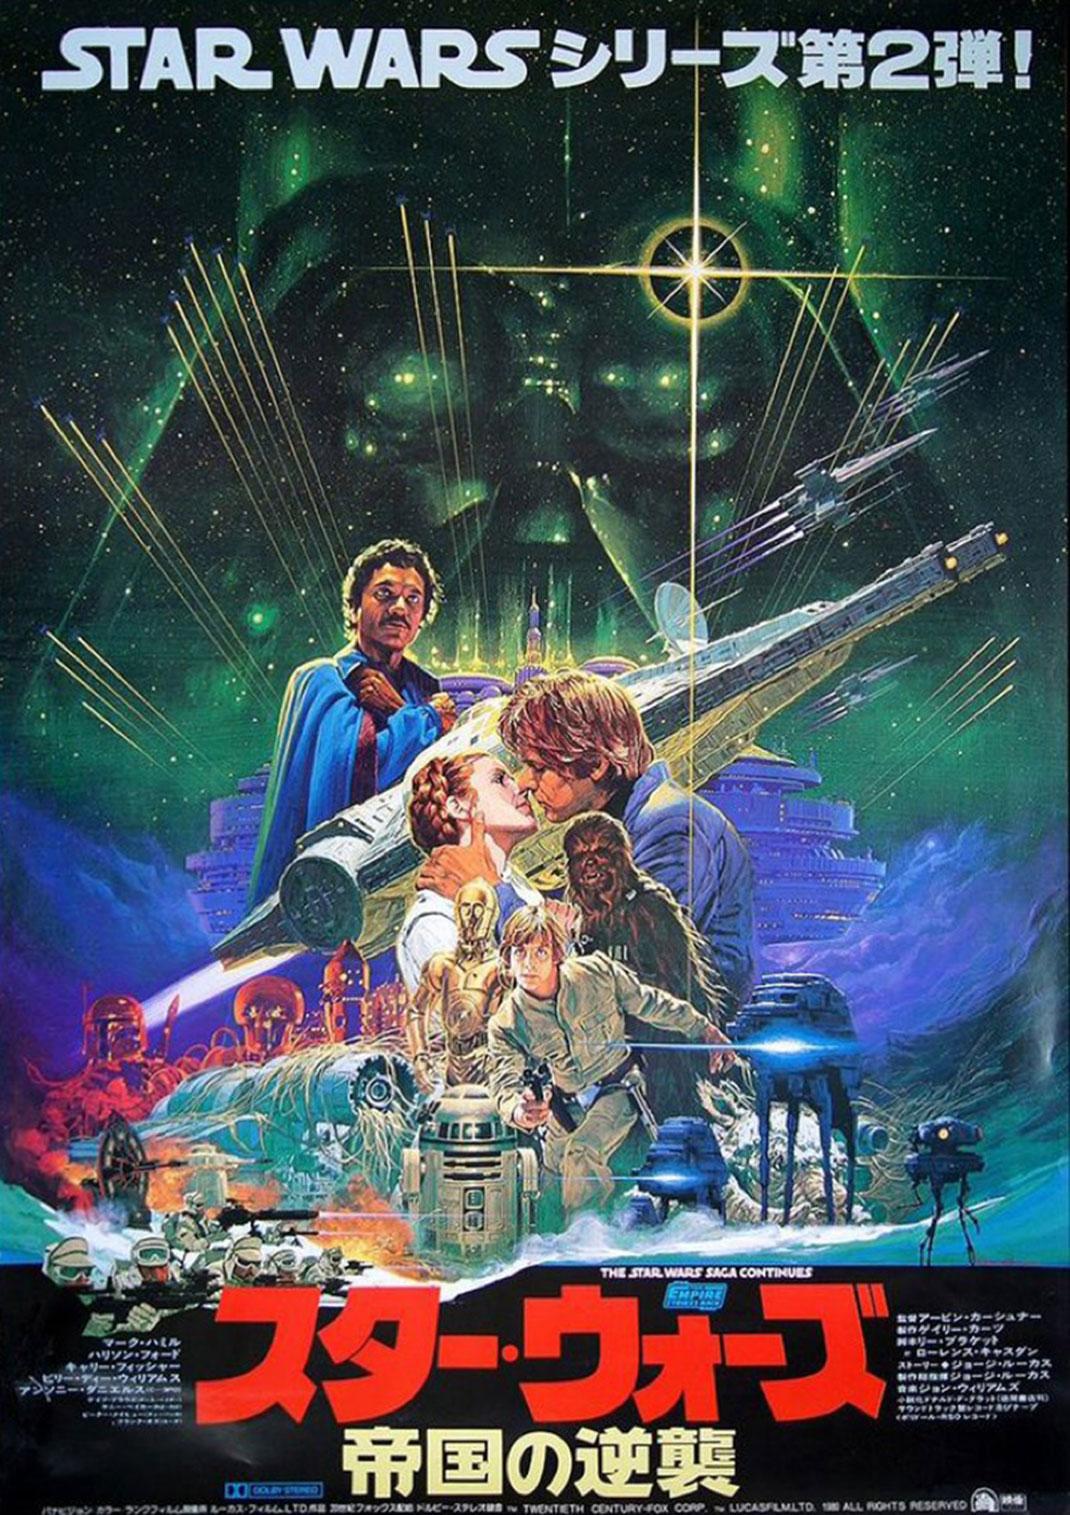 Affiche-Star-Wars-Noriyoshi-Ohrai